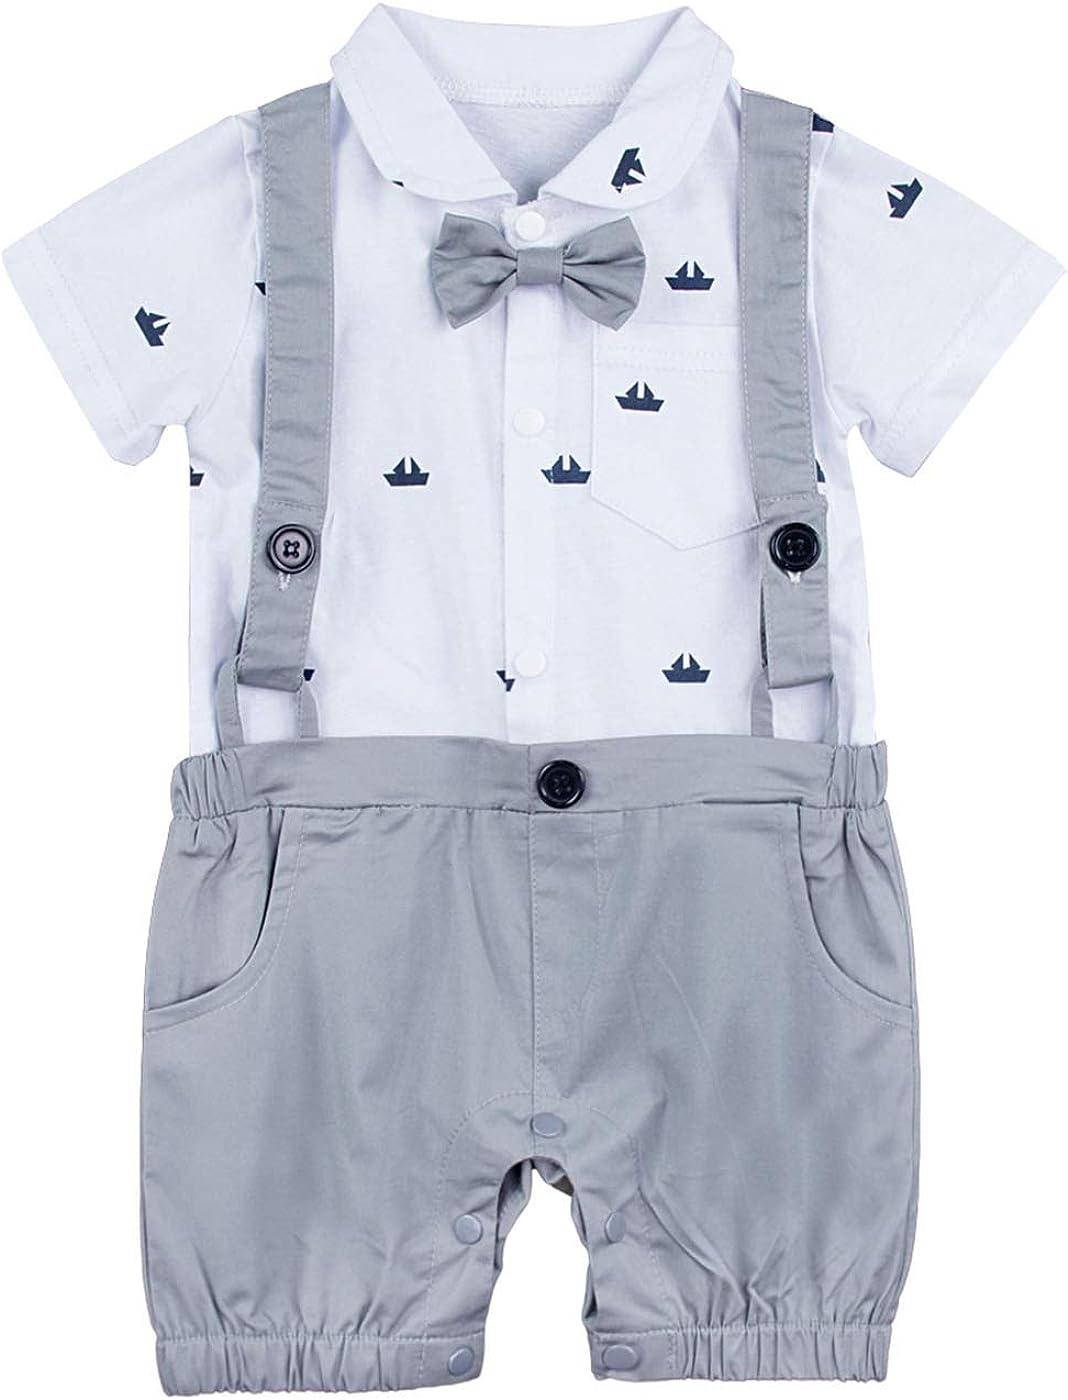 with Bowtie and Hat 3-24 Months mintgreen Baby Boy Gentleman Suspenders Romper 100/% Cotton Printed Bodysuit